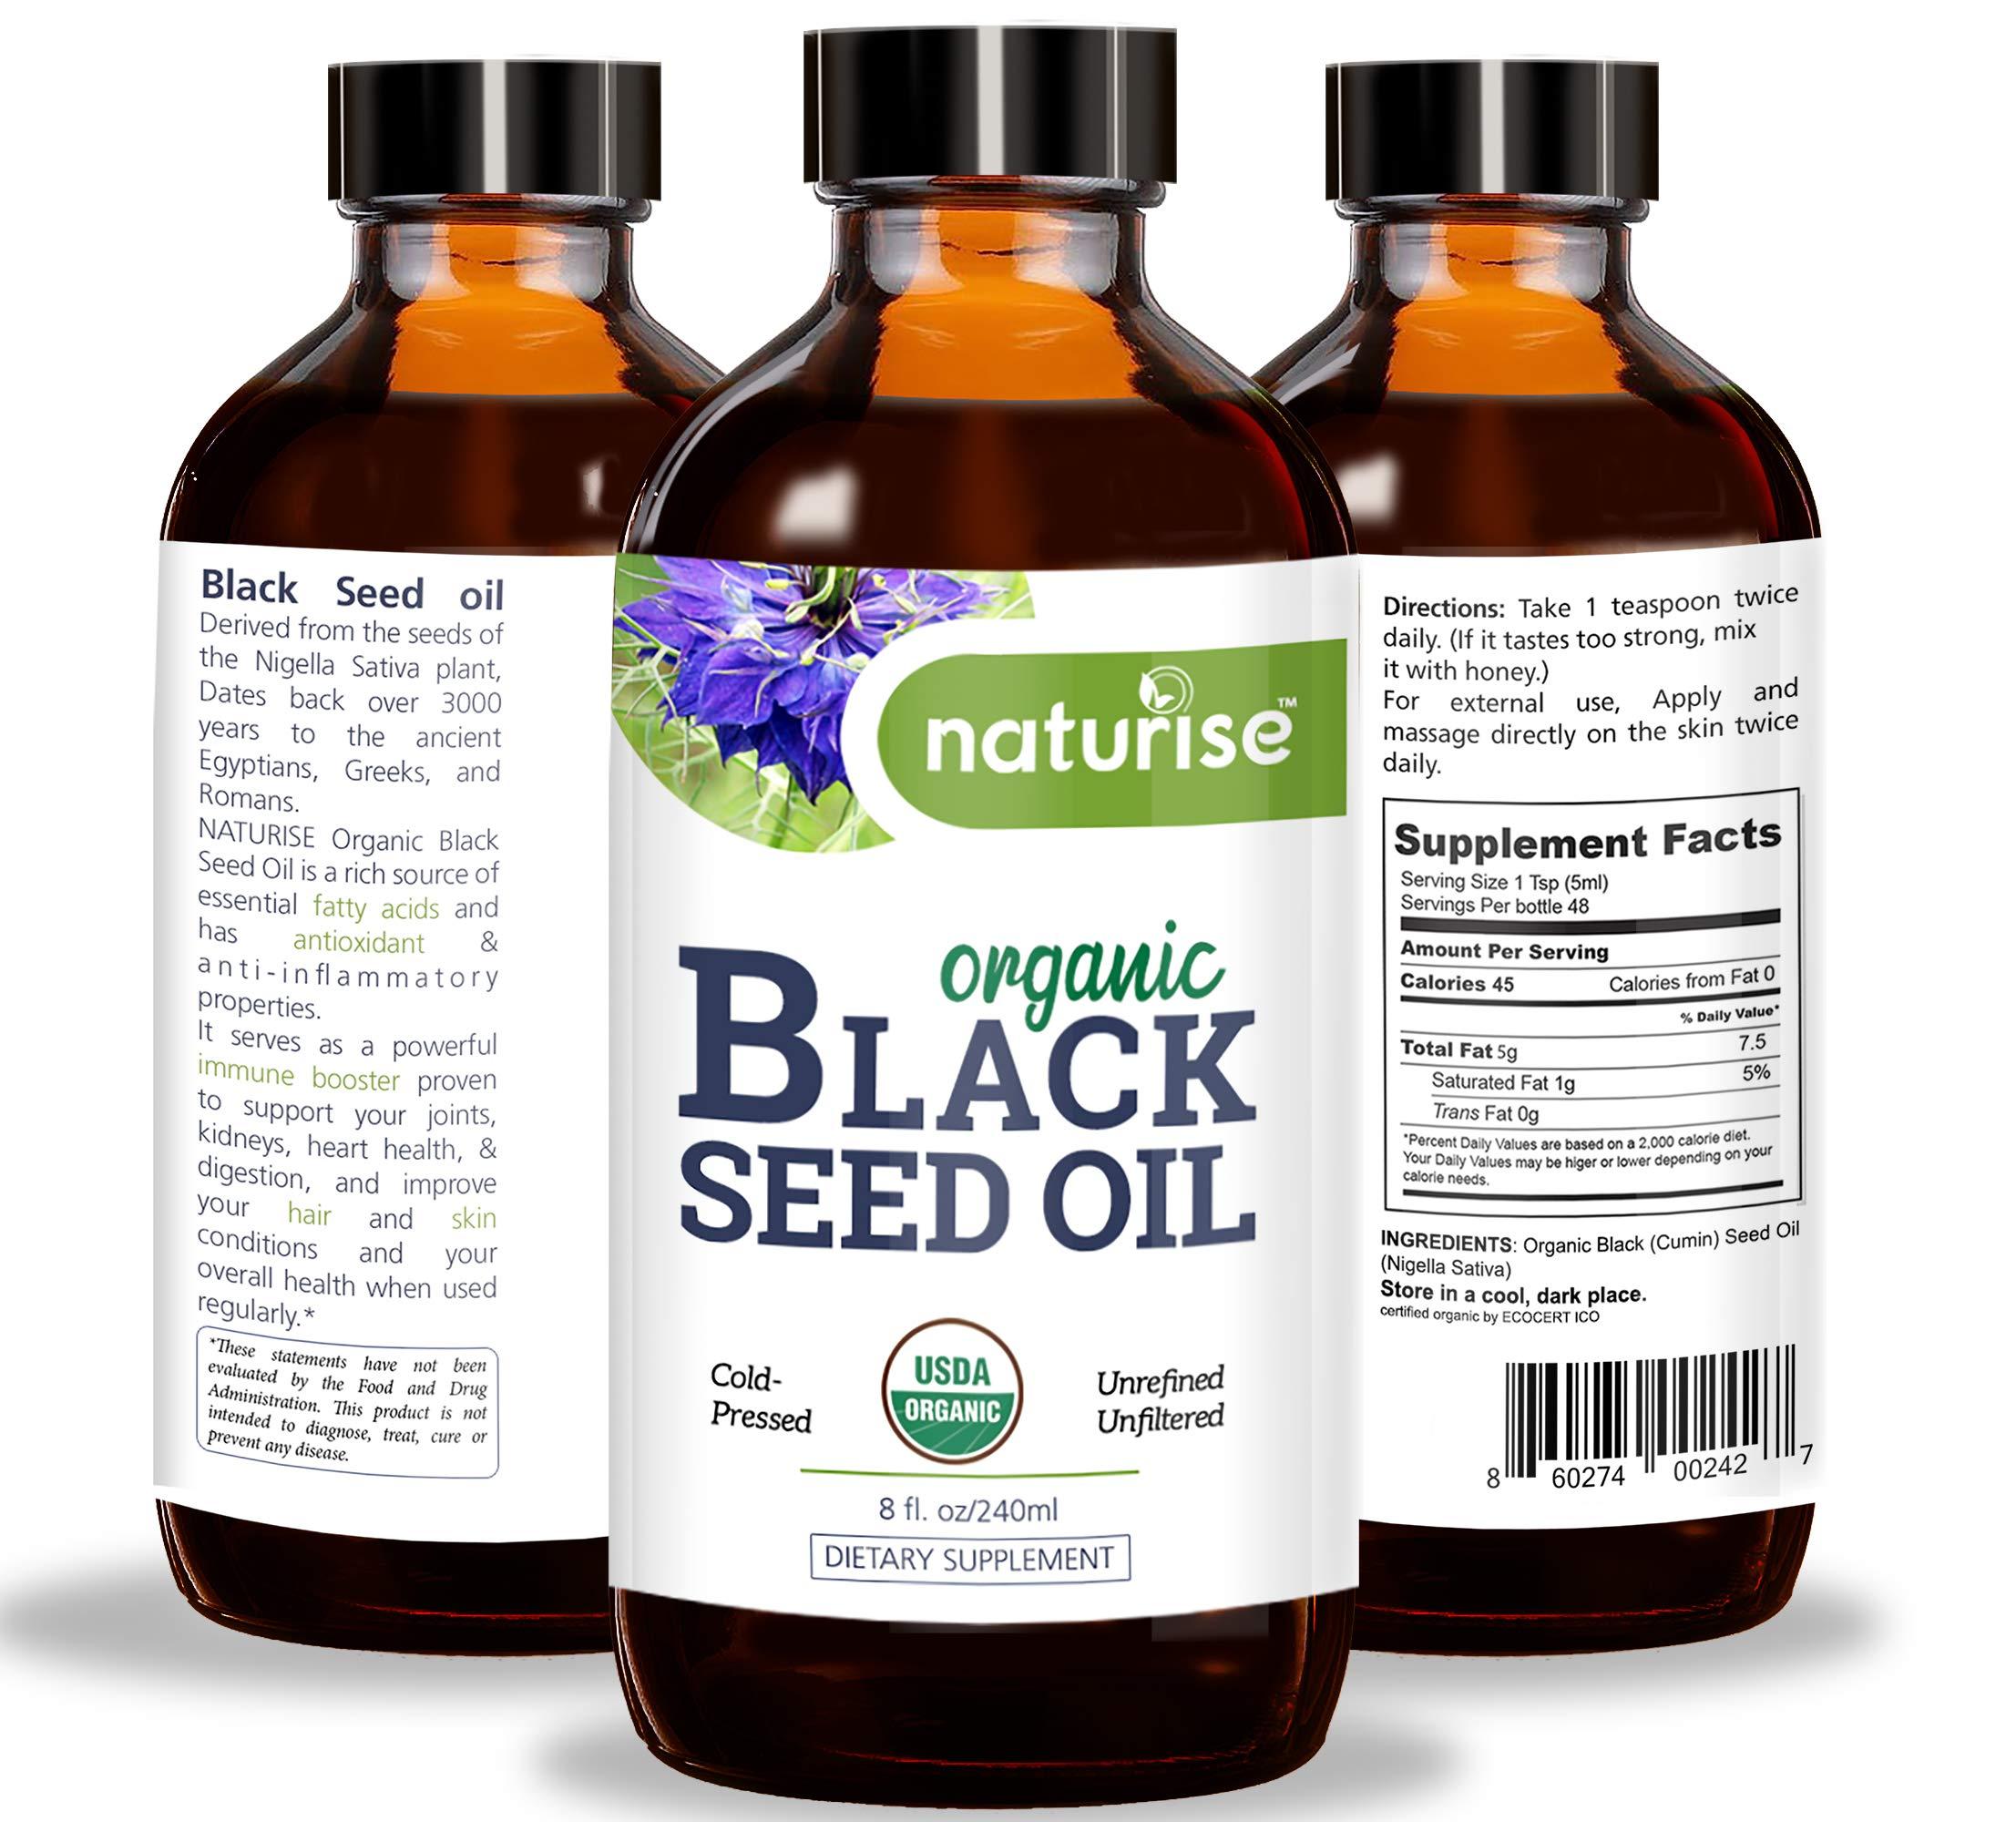 Naturise Black Seed Oil Organic Cold Pressed, Black Cumin Seed Oil Nigella Sativa GLASS BOTTLE (8 oz) Source of Essential Fatty Acids, Omega 3 6 9, Antioxidant for Immune Boost, Joints, Skin, & Hair